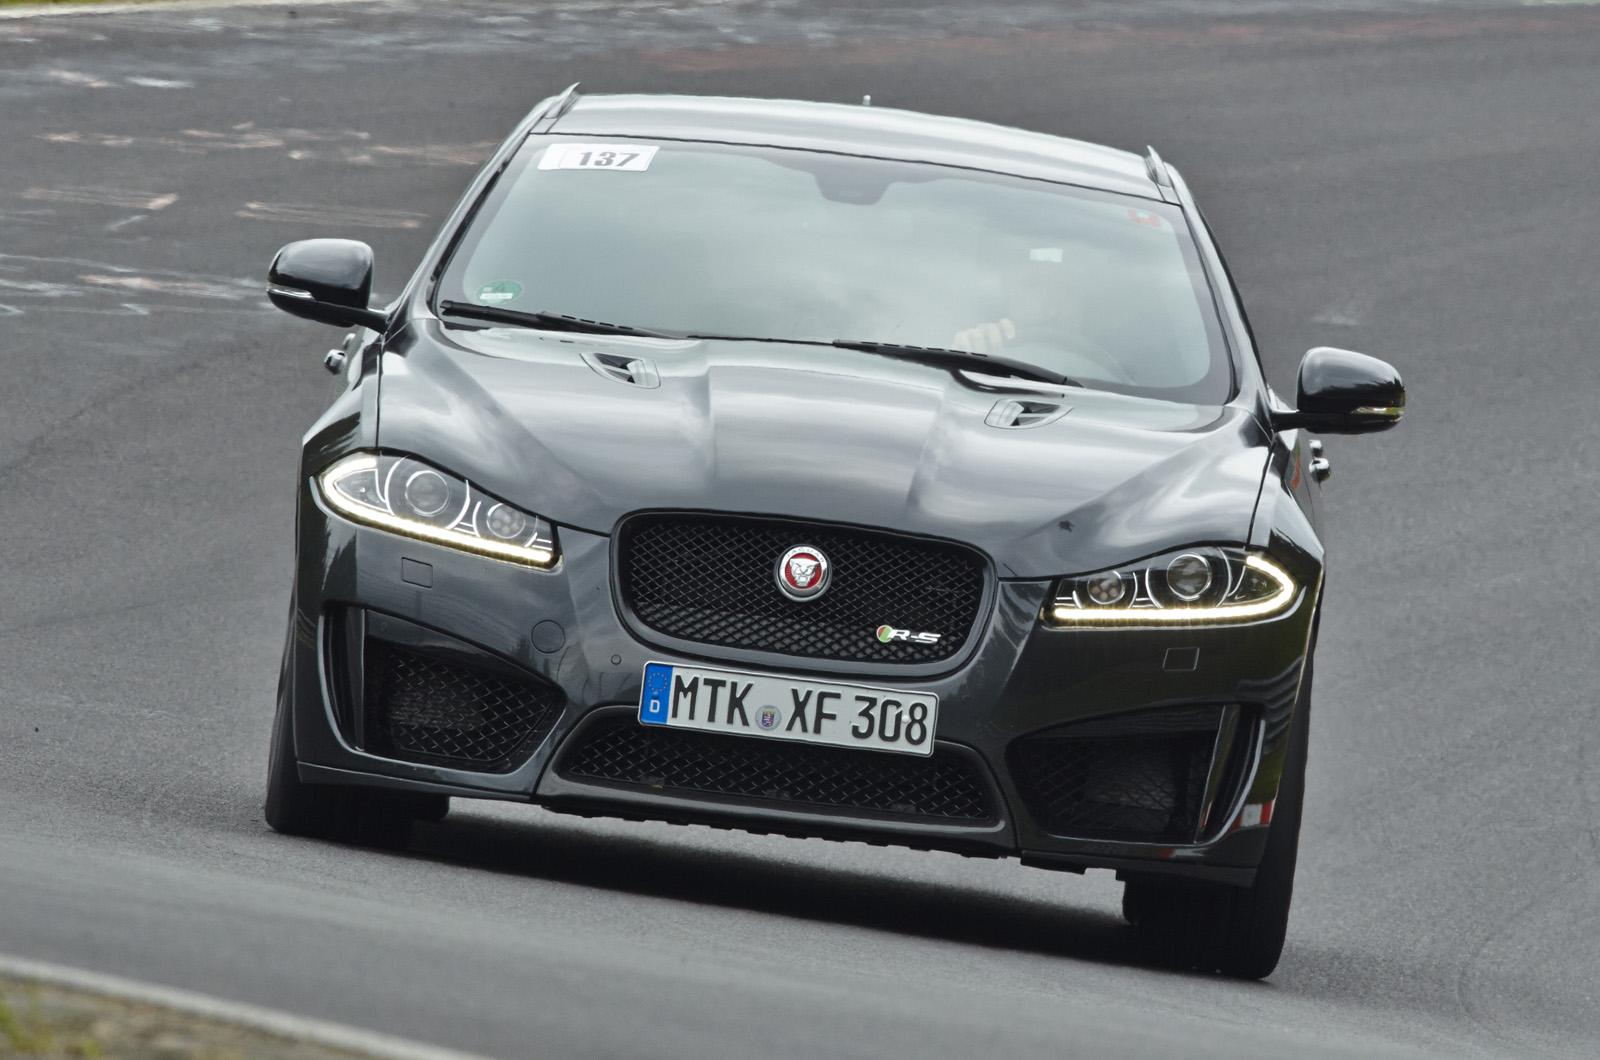 Jaguar xfr s sportbrake - photo#24